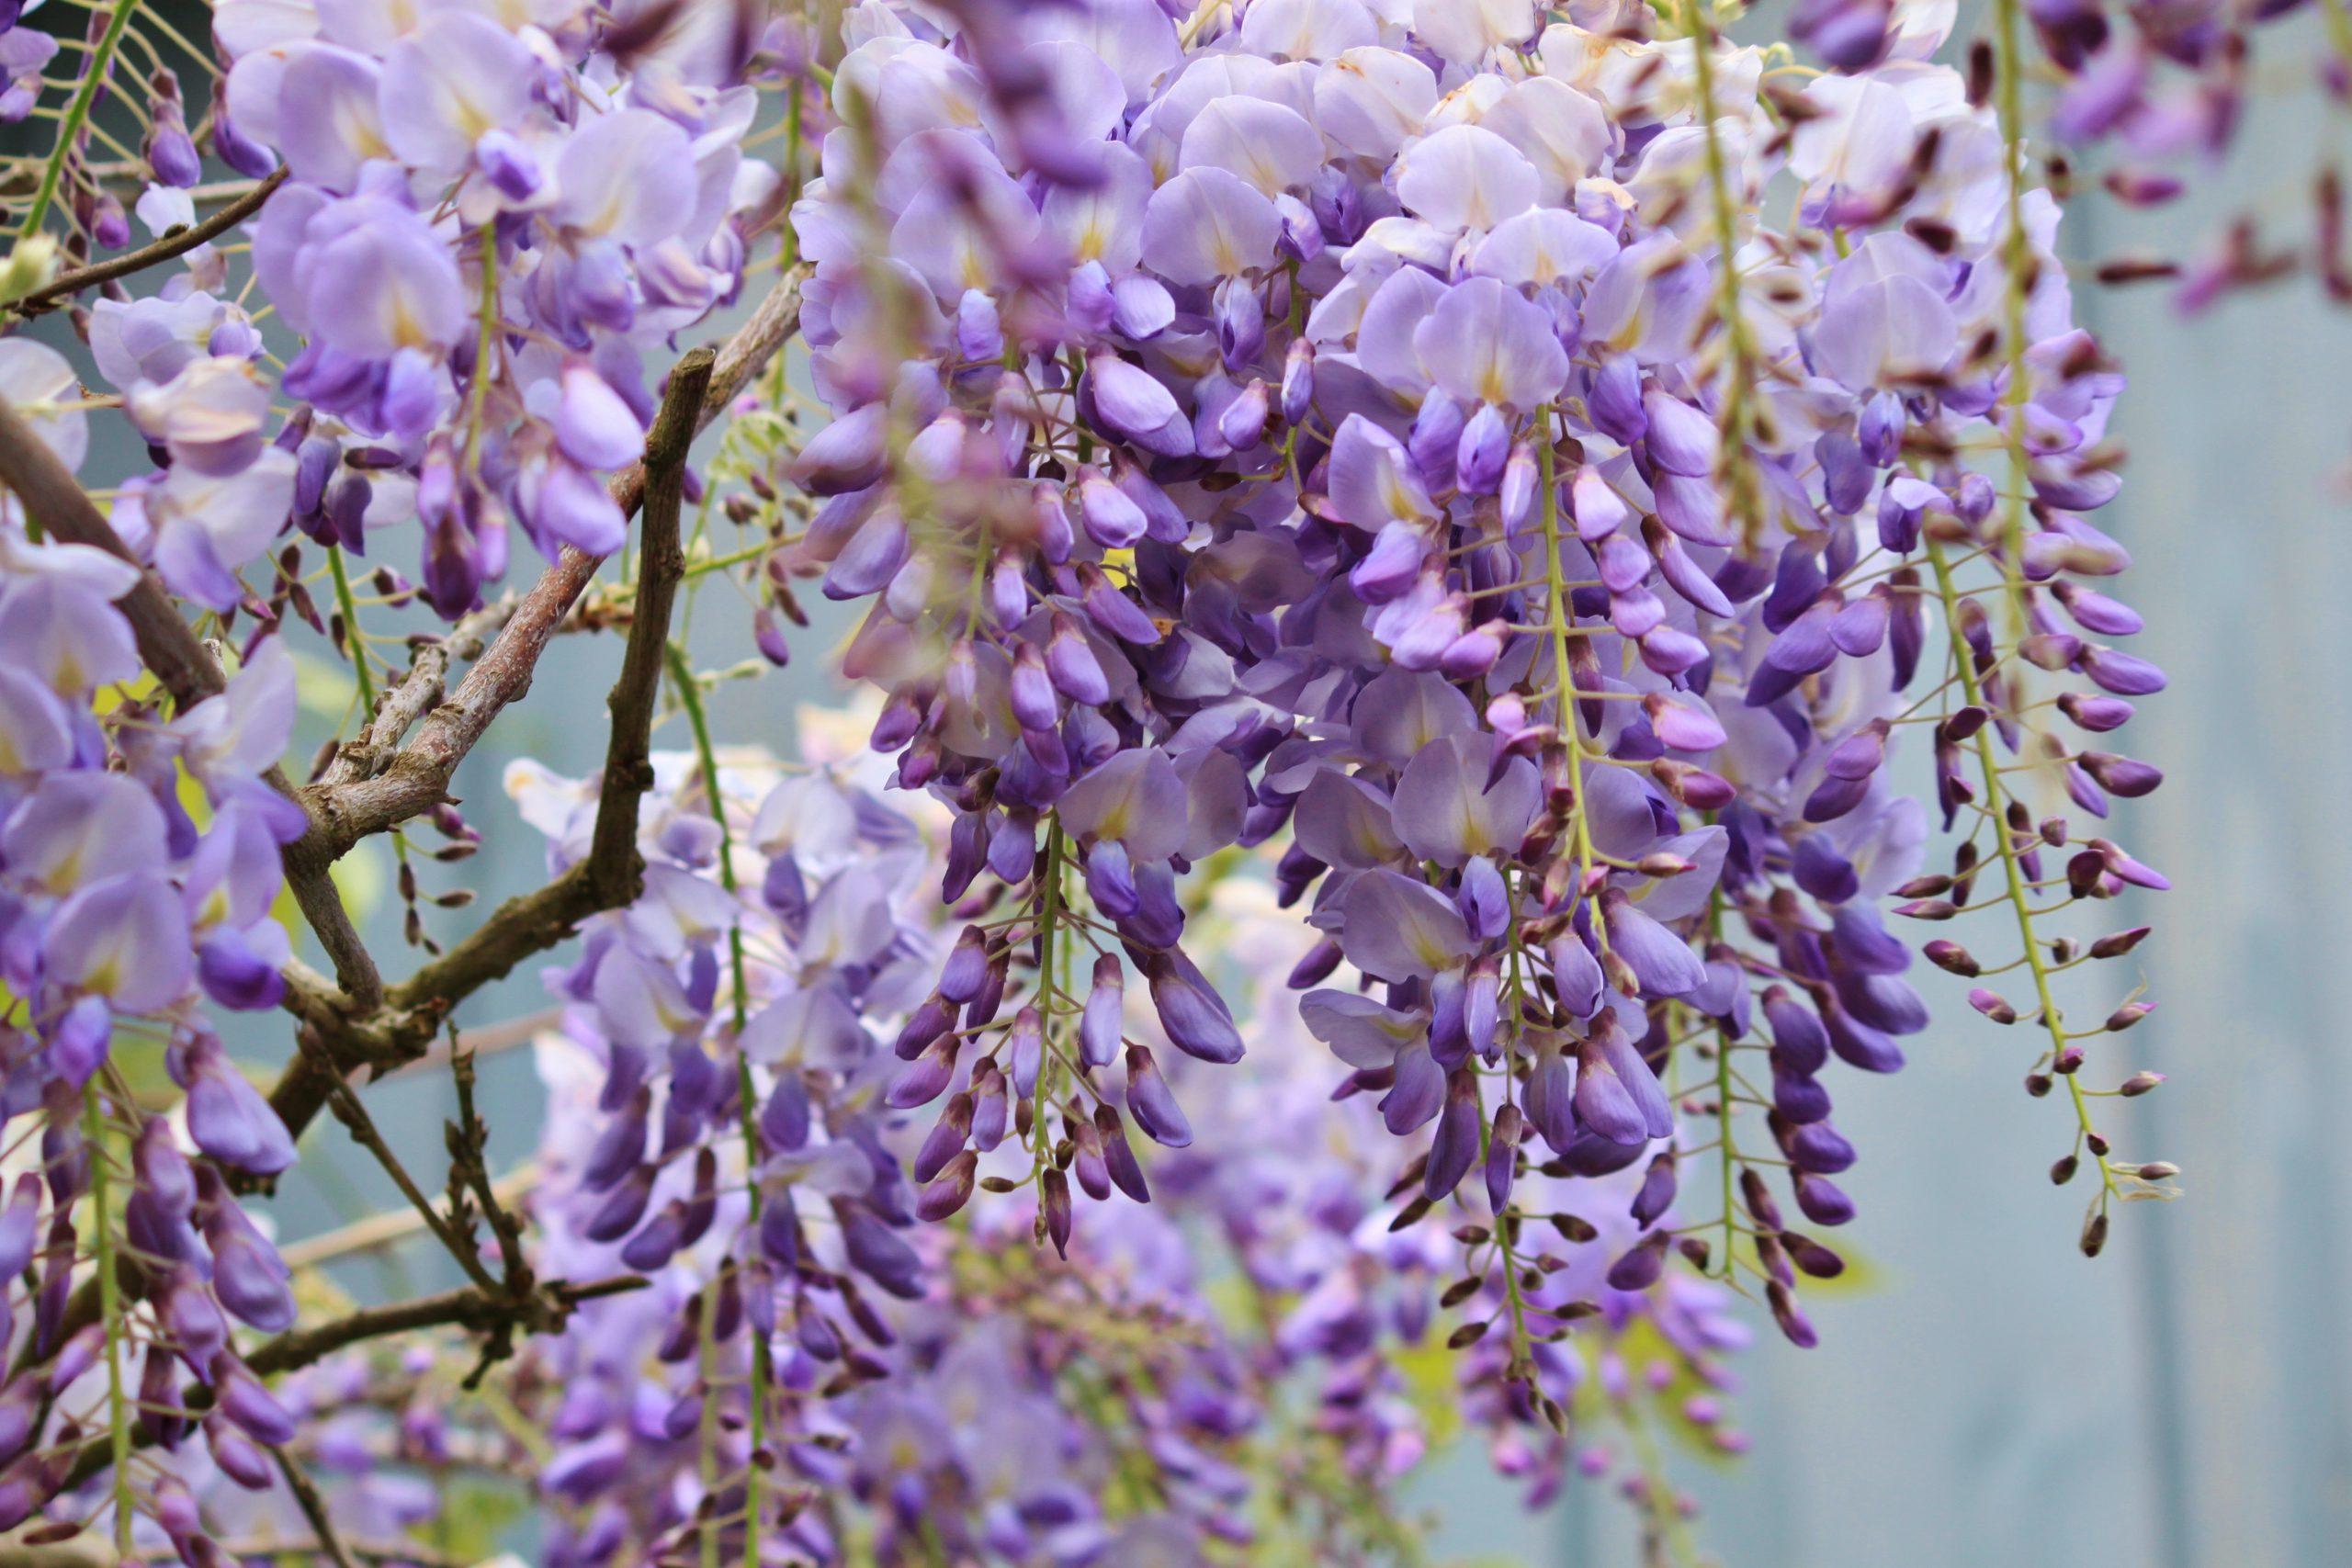 La wisteria es una trepadora de exterior